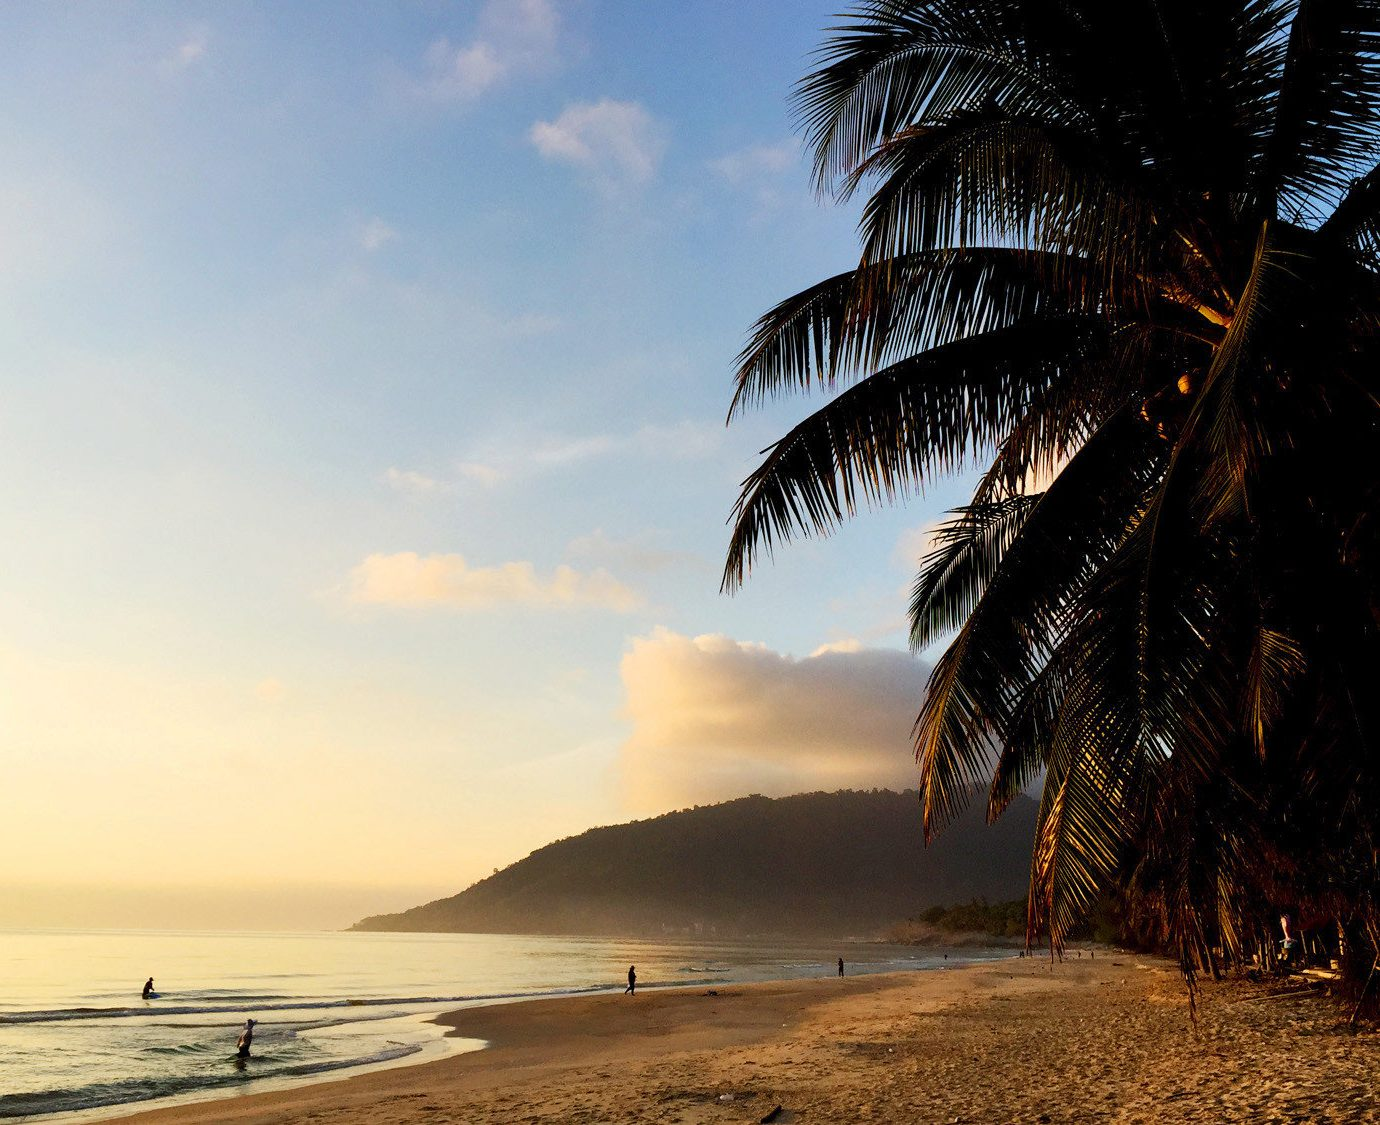 Beach Beachfront Ocean Tropical sky tree water plant Sea Coast palm morning Sunset arecales sunlight evening dusk dawn sunrise palm family tropics shore sandy shade distance